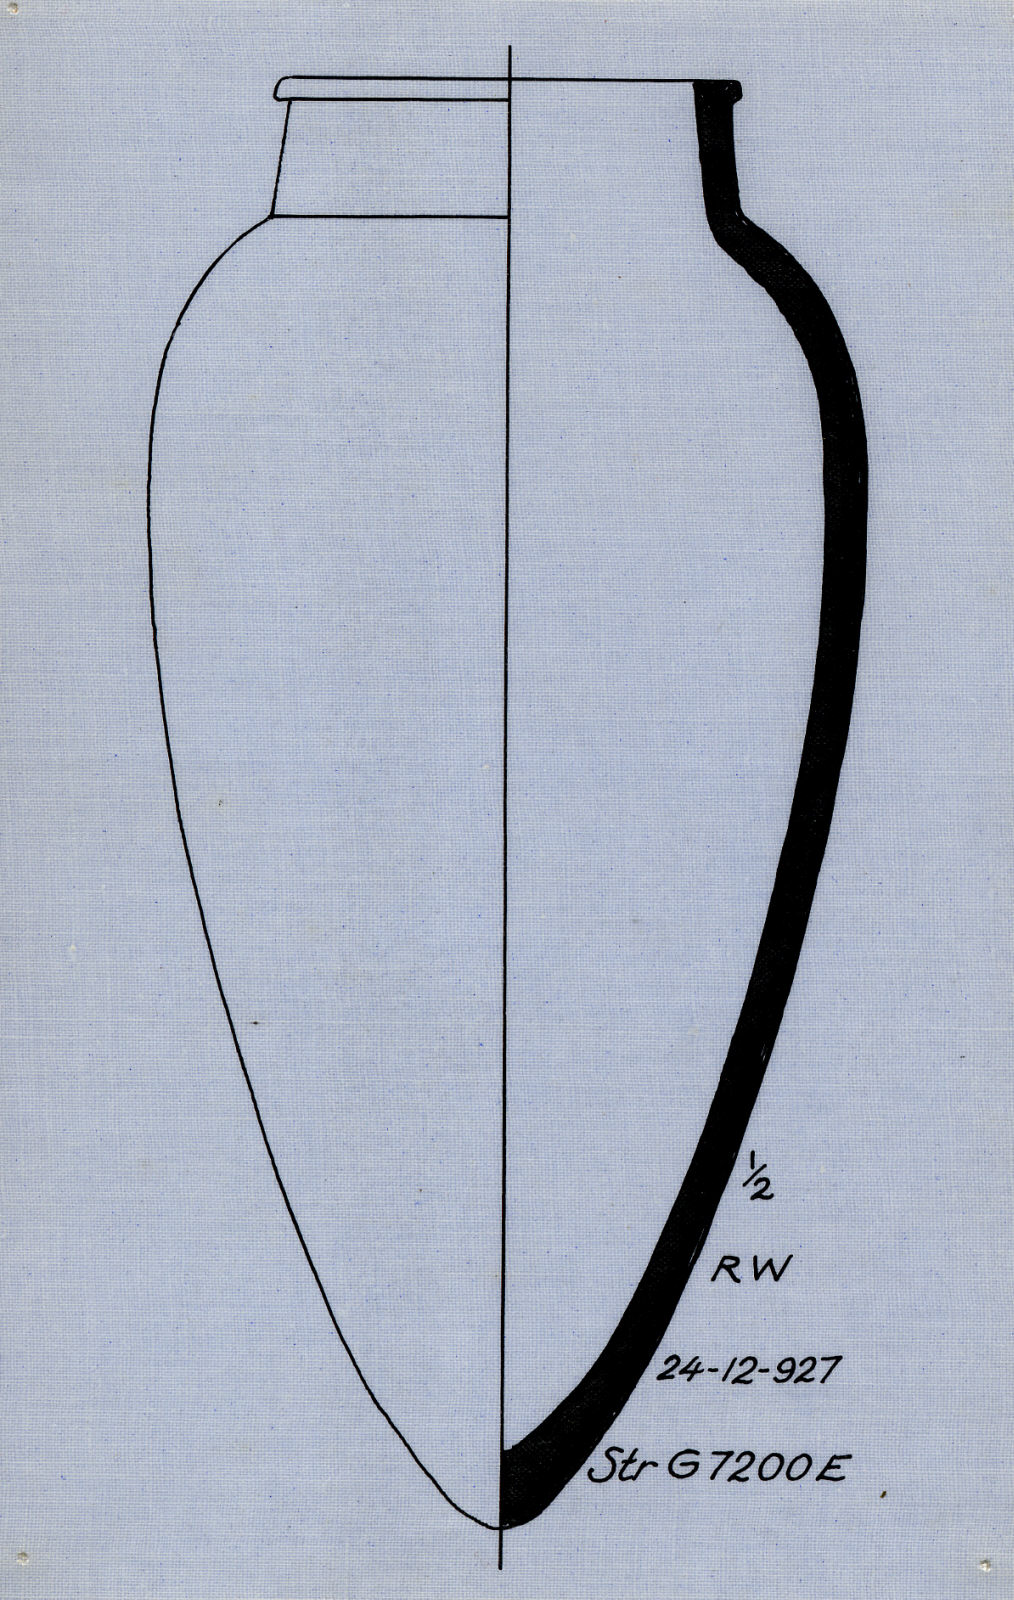 Drawings: Street G 7200, E of G 7220: pottery, jar